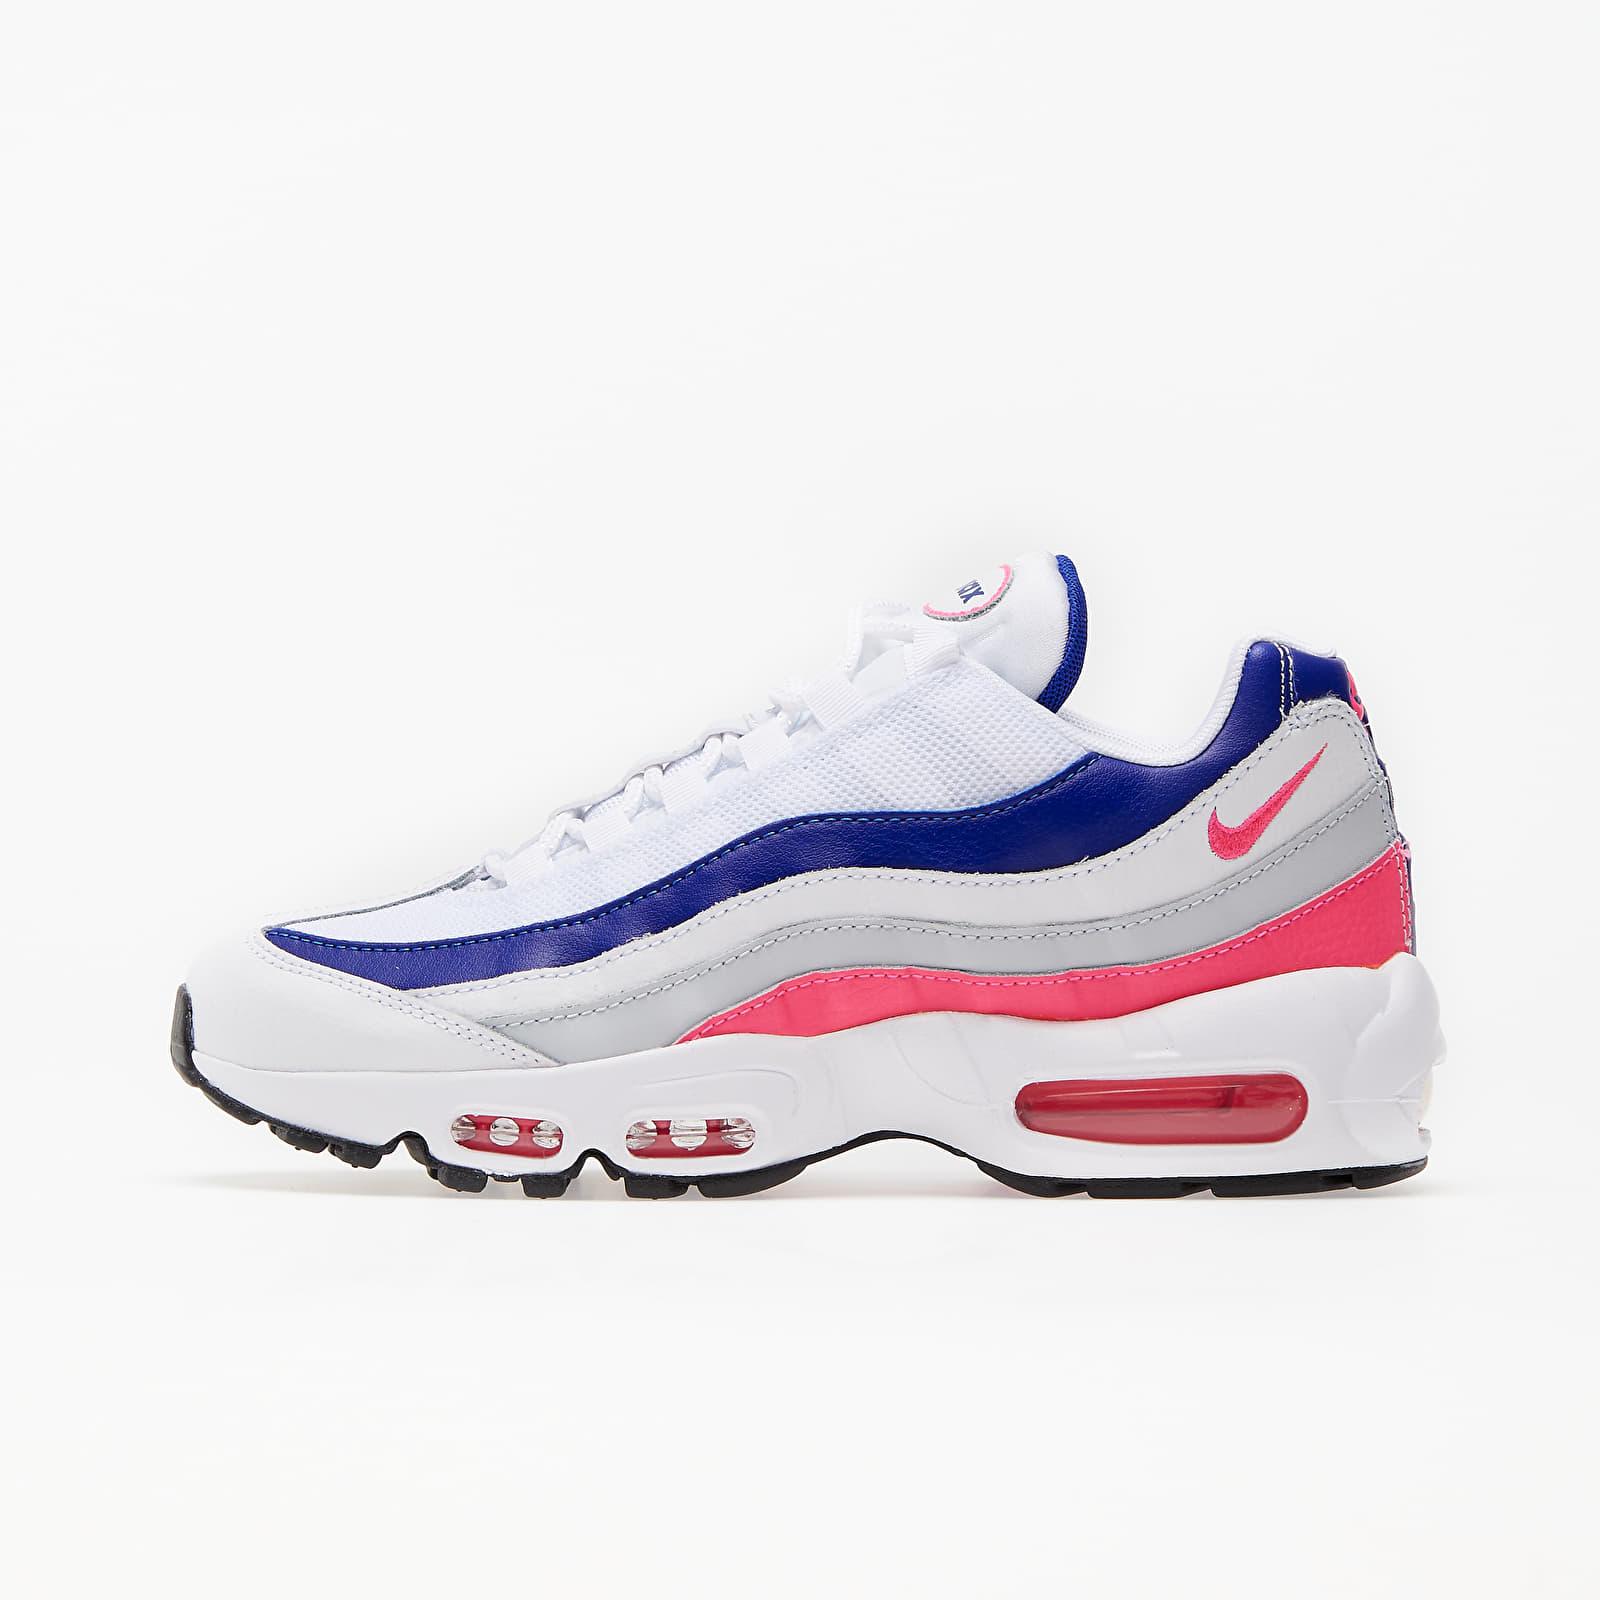 Nike Wmns Air Max 95 White/ Hyper Pink-Concord-Pure Platinum EUR 36